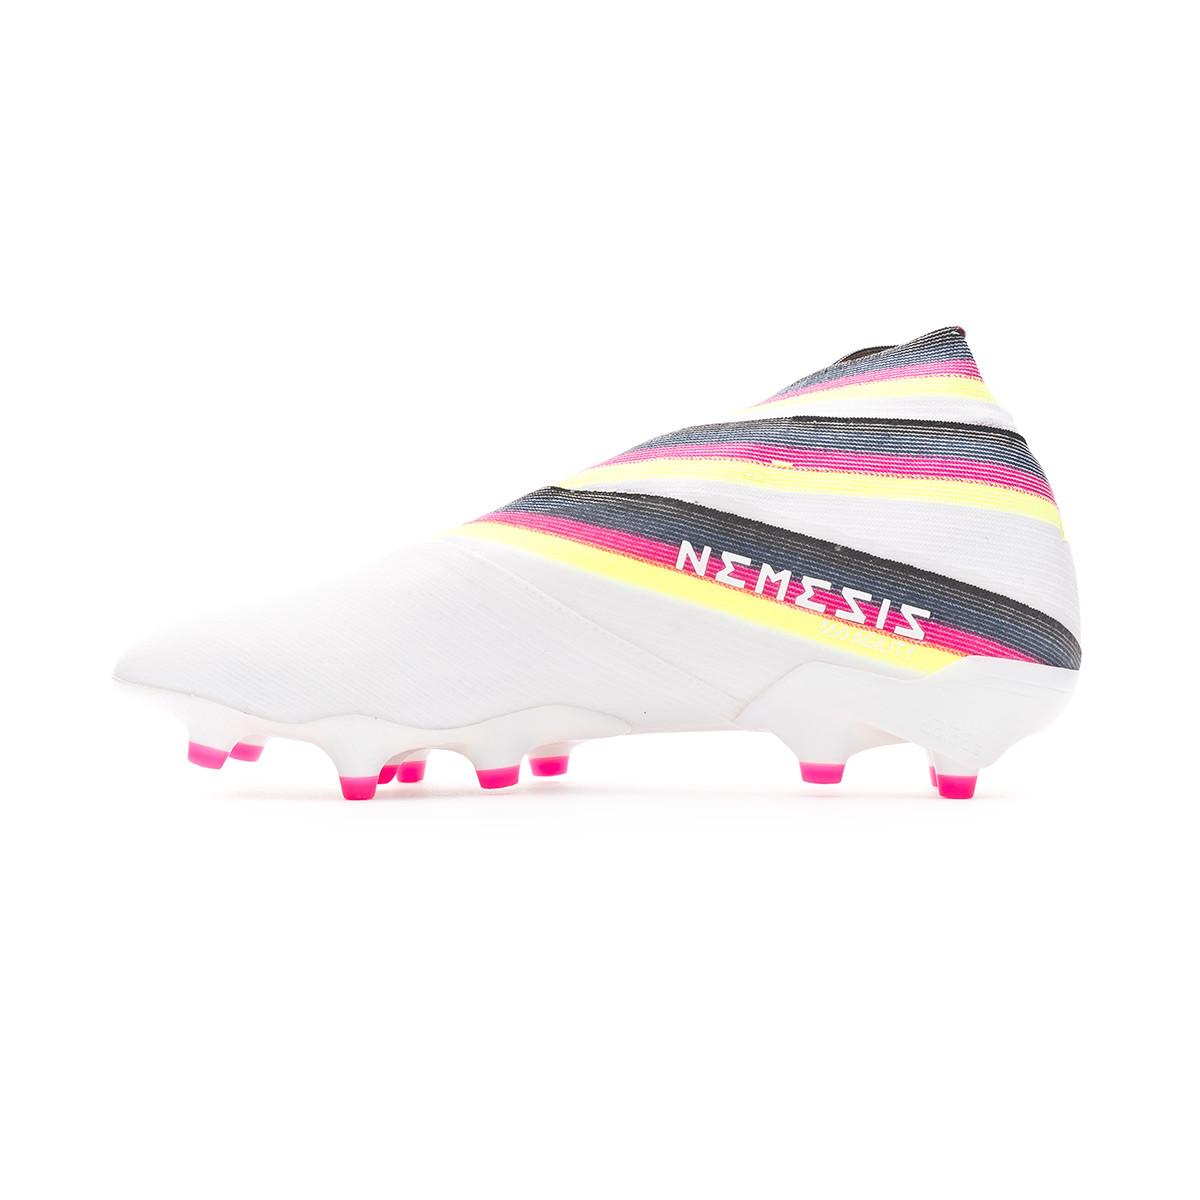 Chaussure de foot adidas Nemeziz 19+ FG ADV